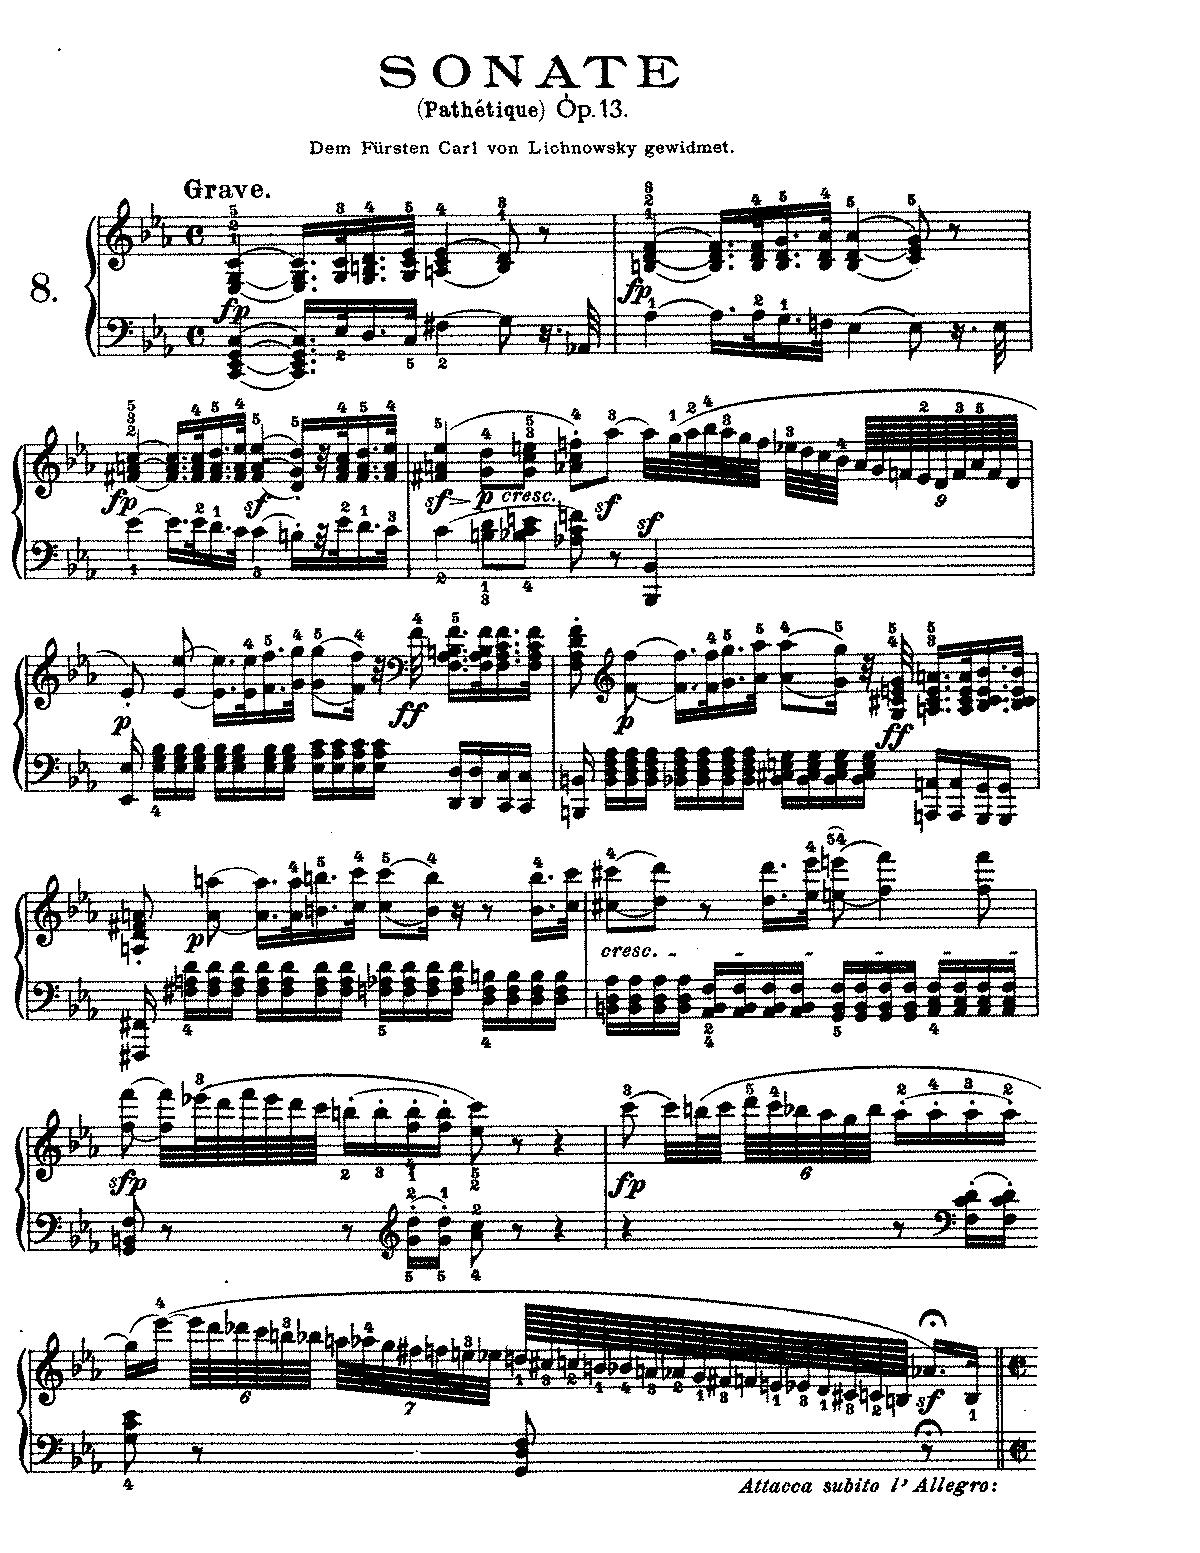 beethoven pathetique 2nd movement sheet music